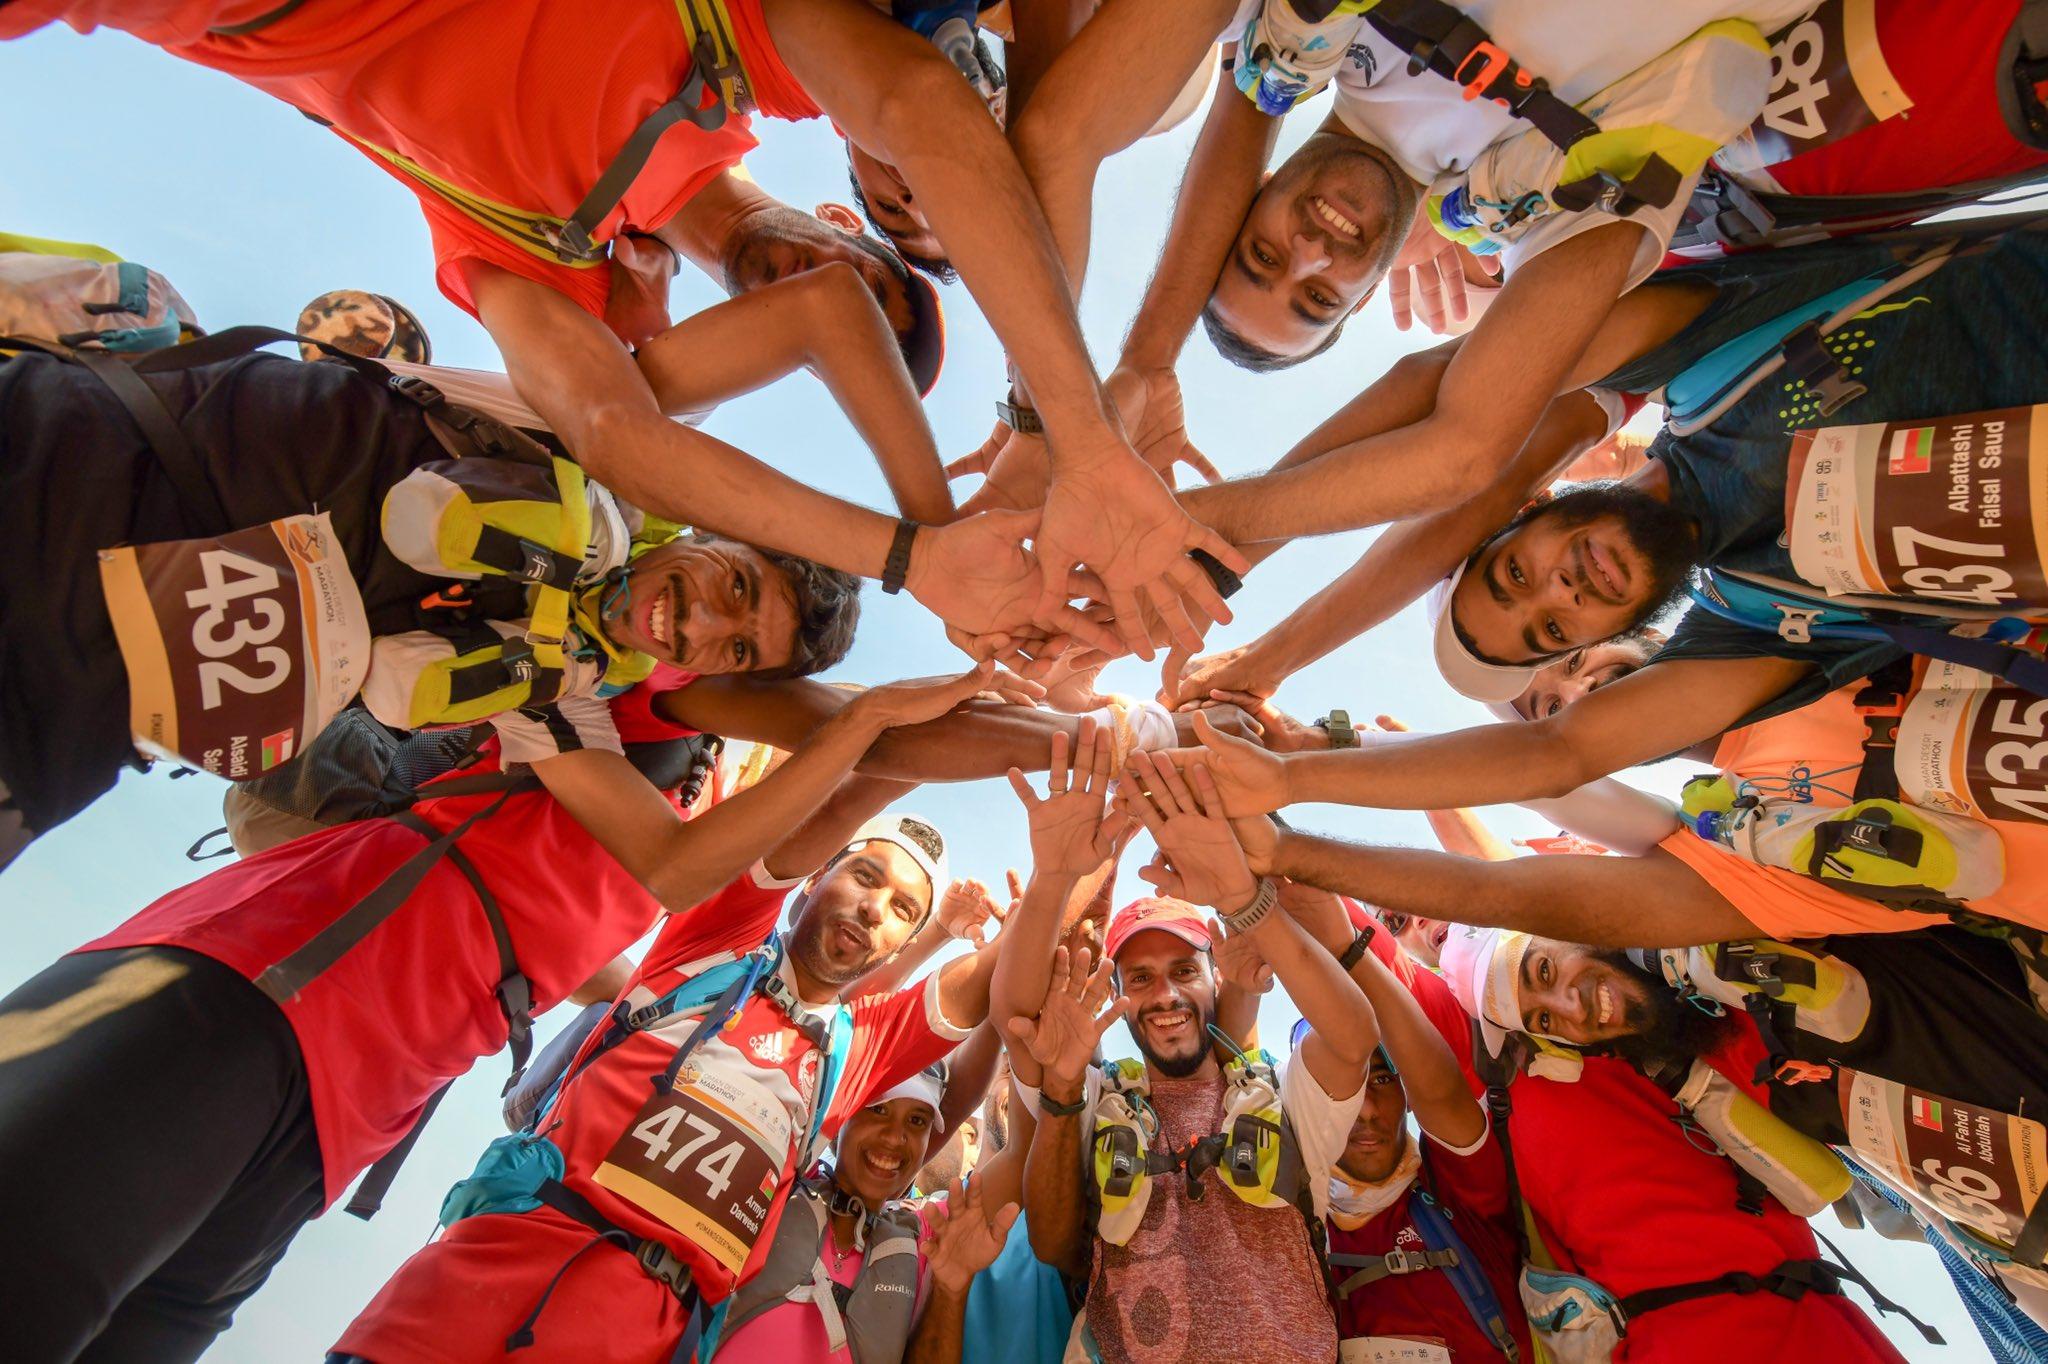 Here's who won the 6th Oman Desert Marathon